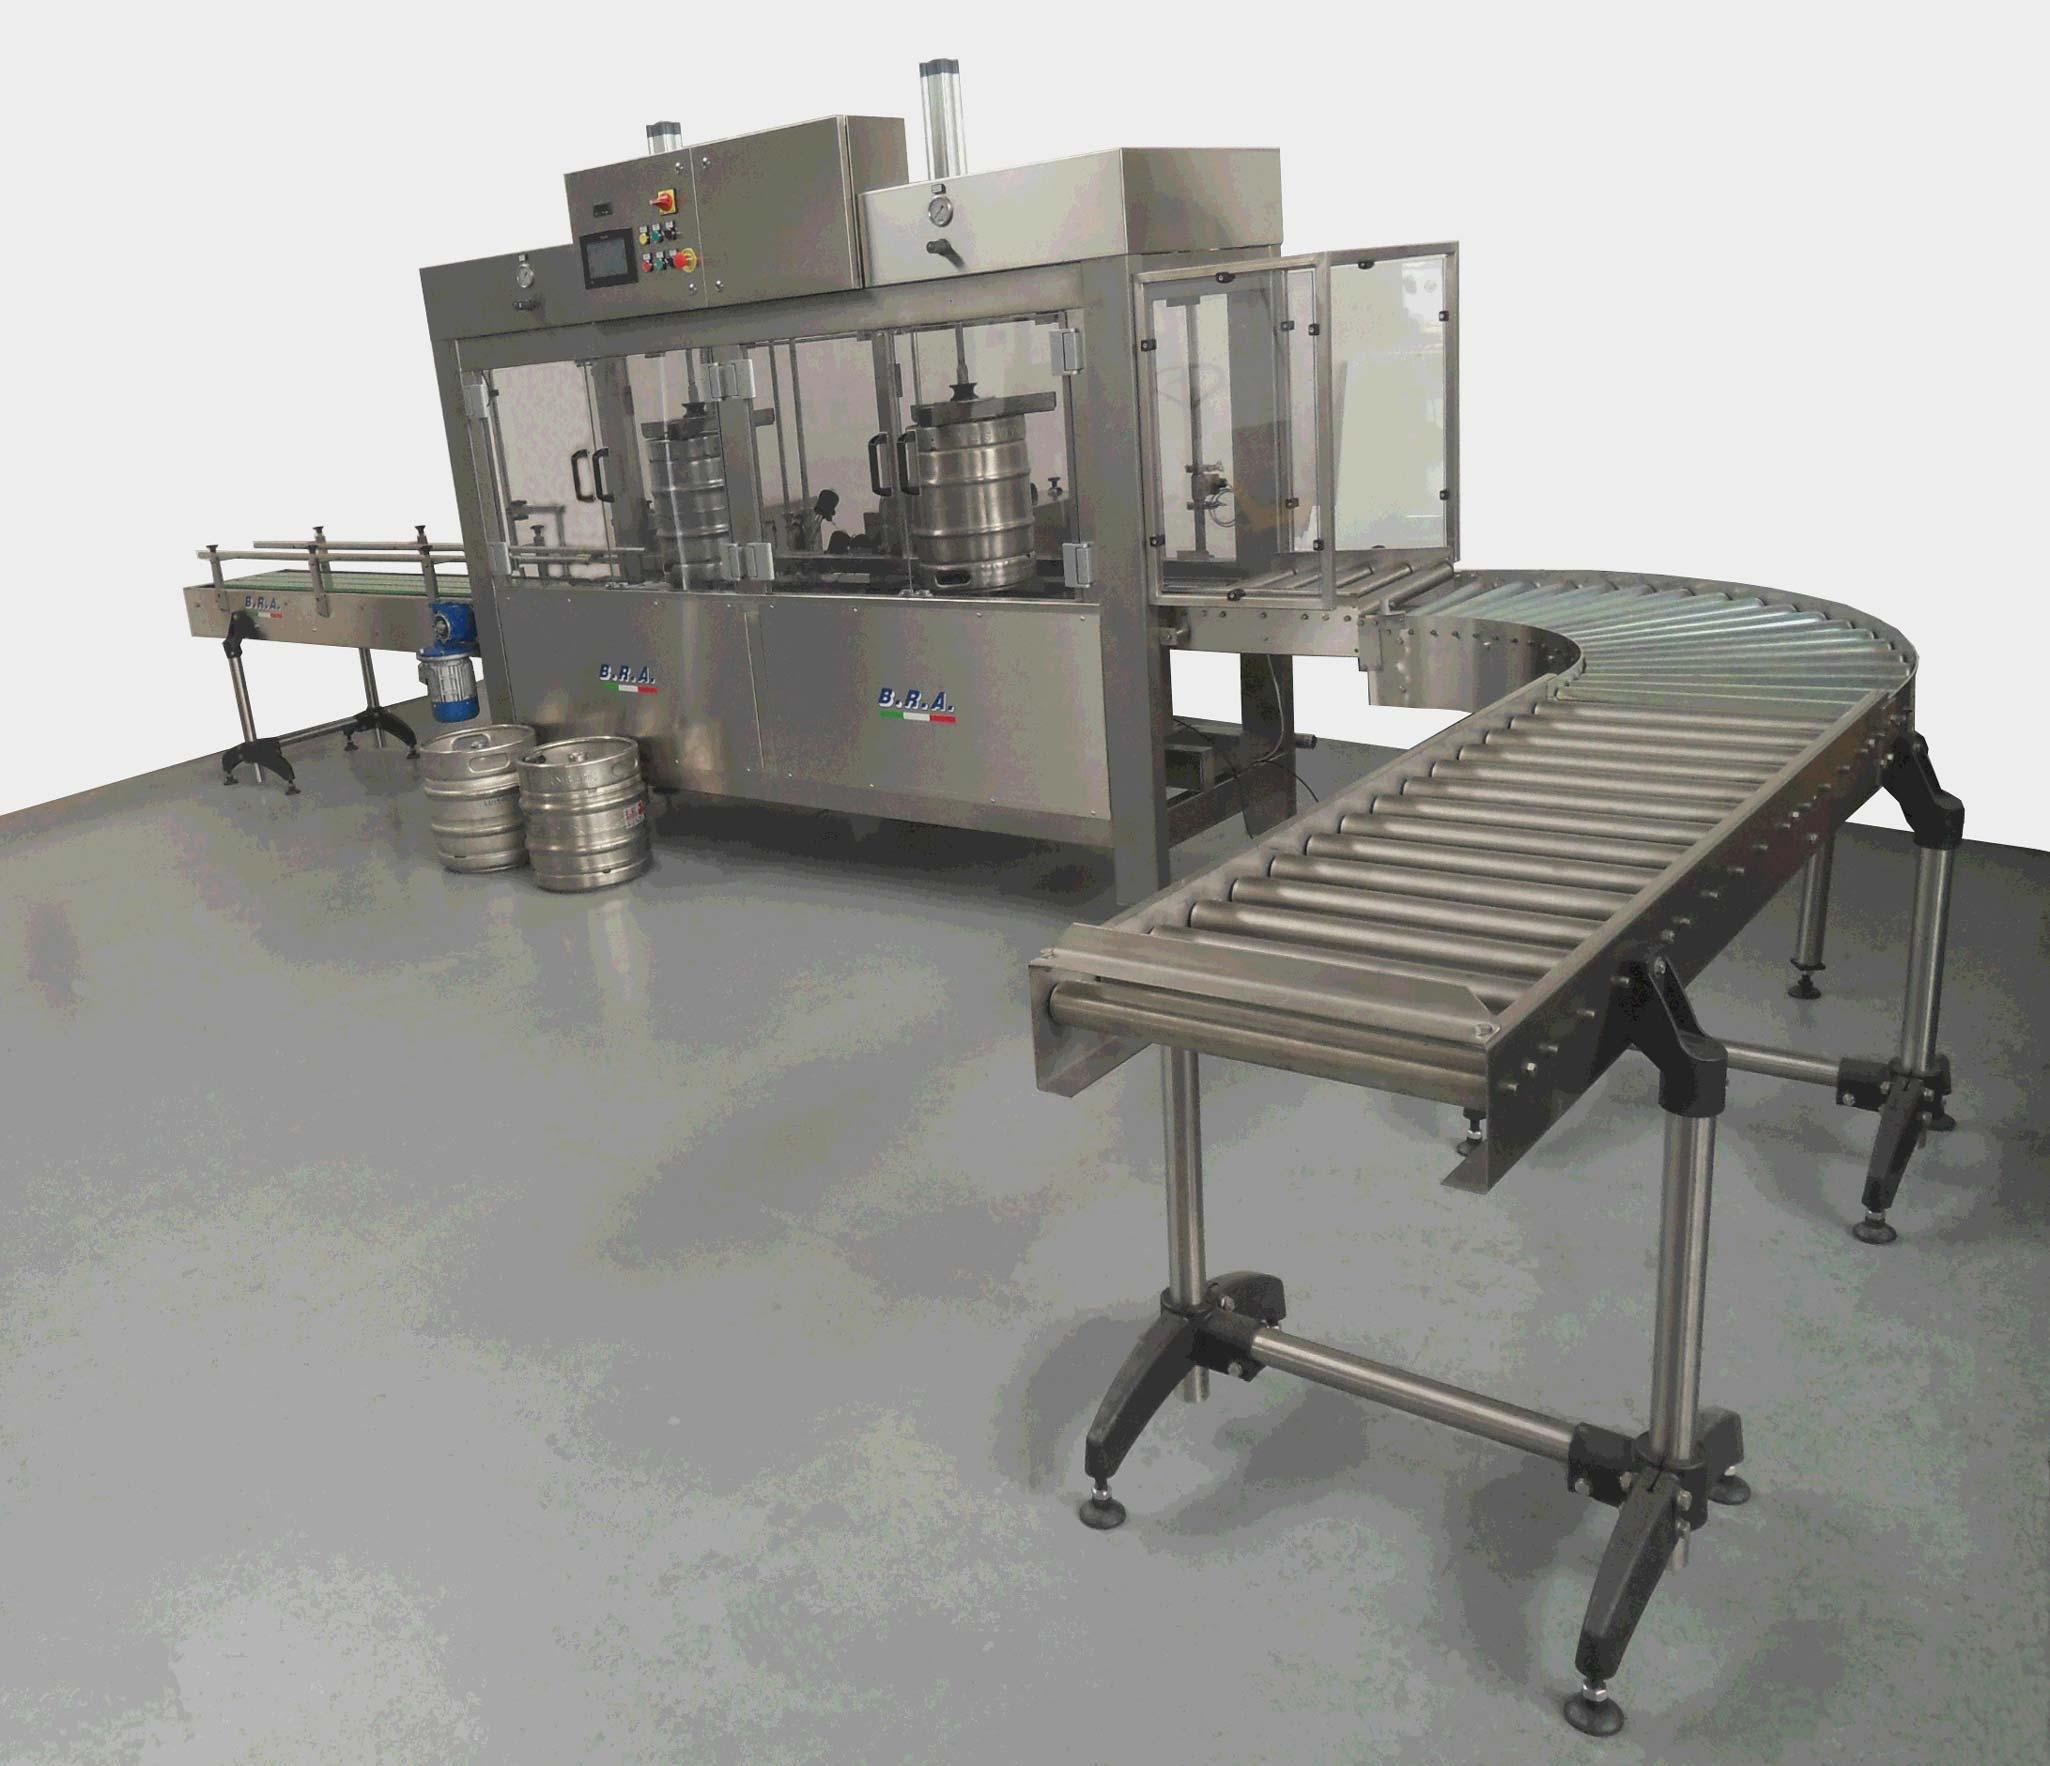 b-r-a-modular-keg-line--with-roller